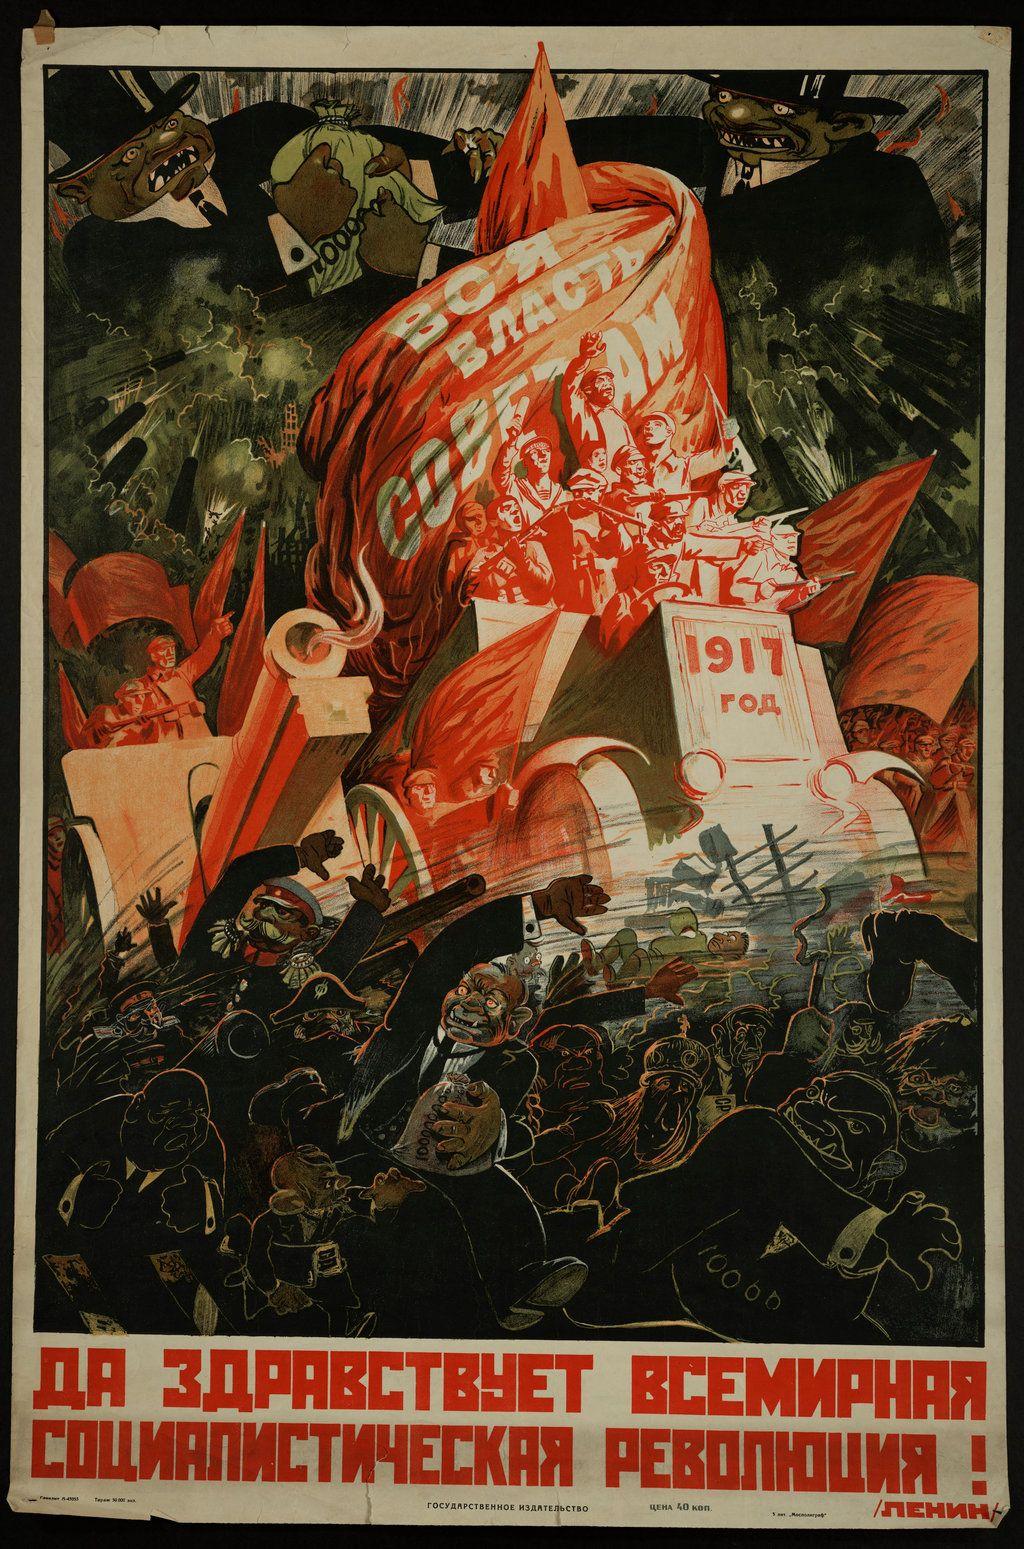 long live the international socialist revolution! by theSovietpatriot12